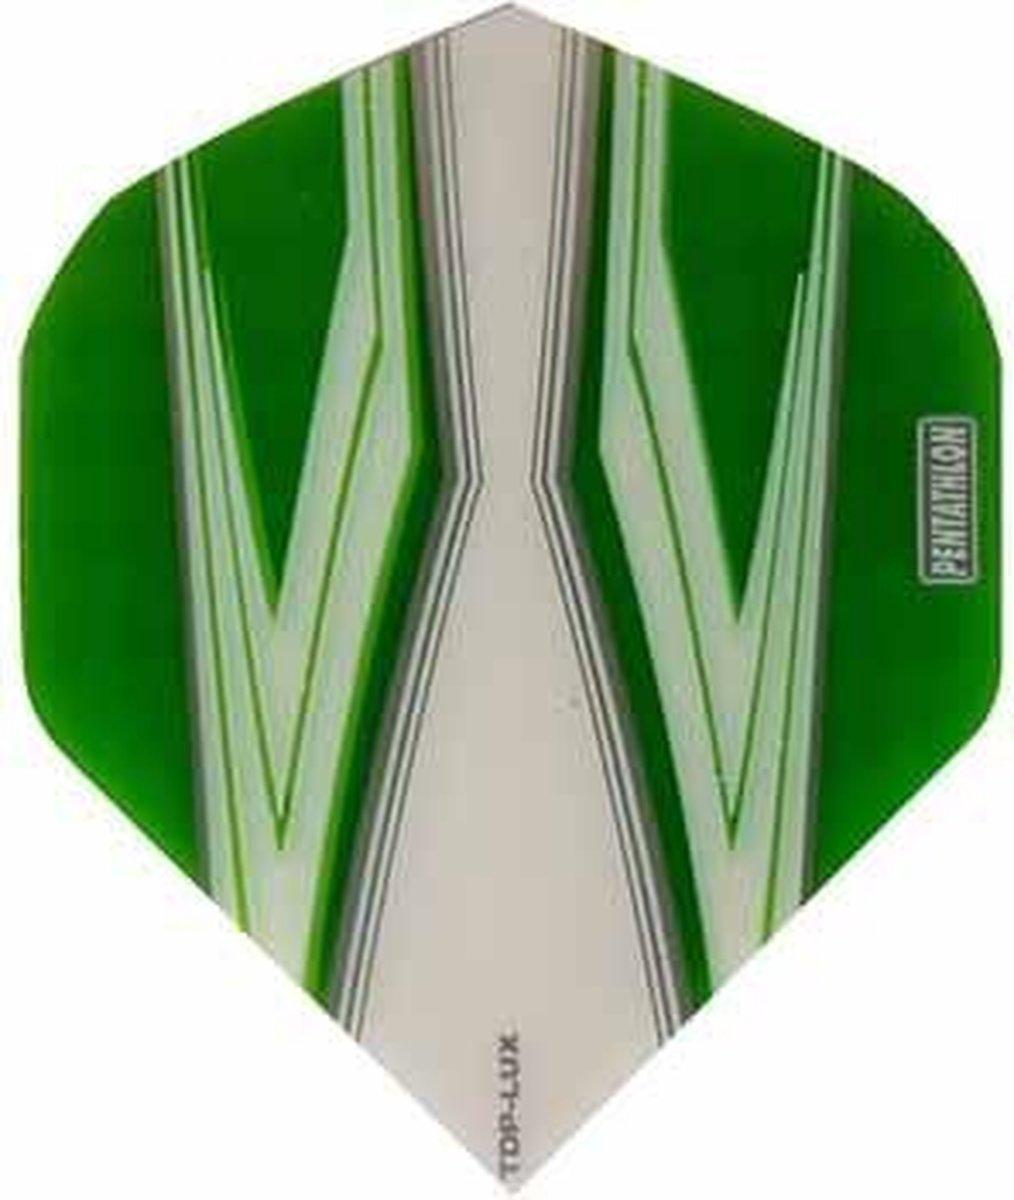 ABC Darts Flights Pentathlon - Spitfire W groen - 10 sets